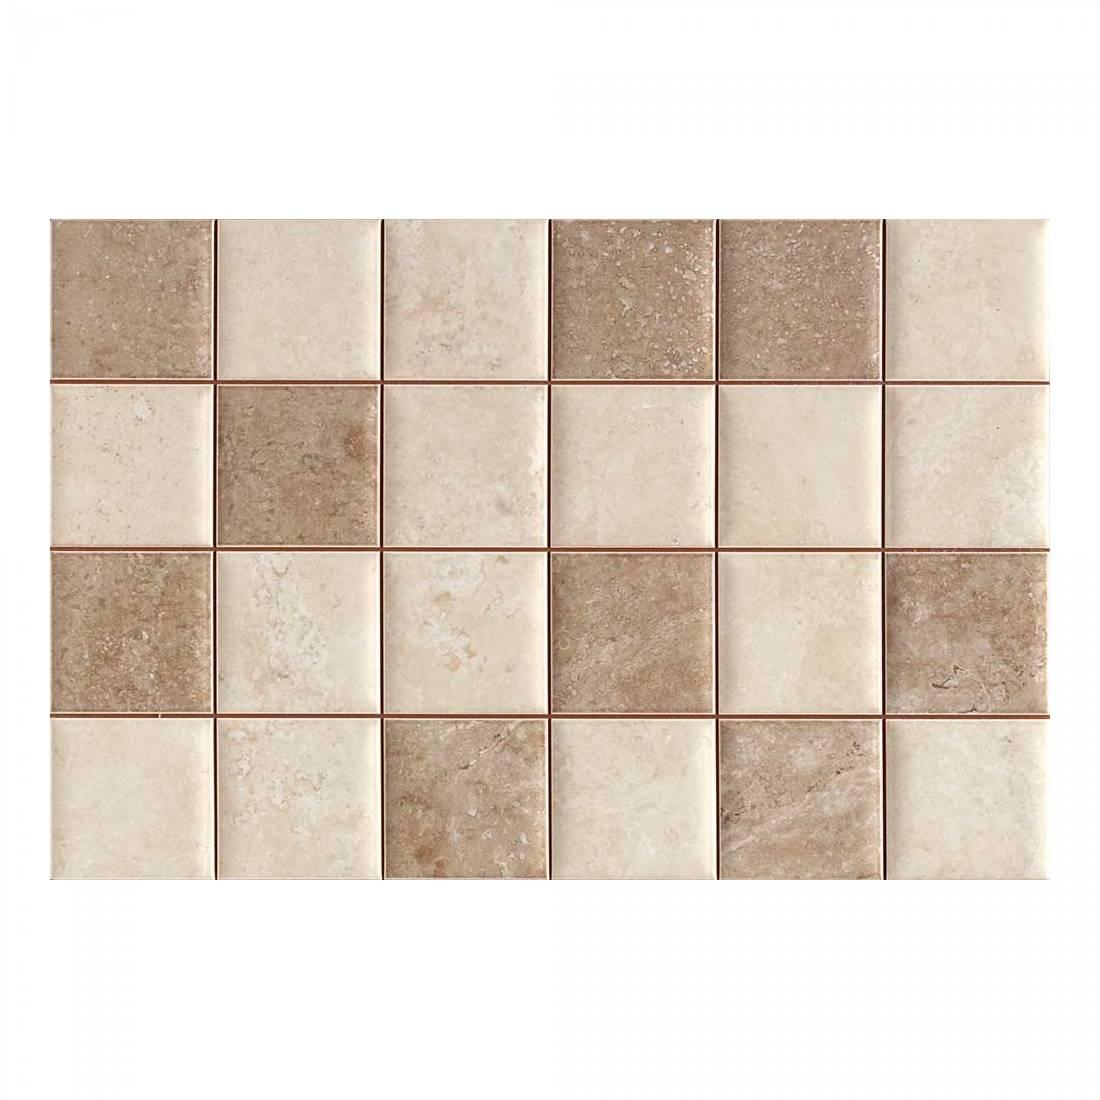 Fez Block 31.6x48 Beige 1